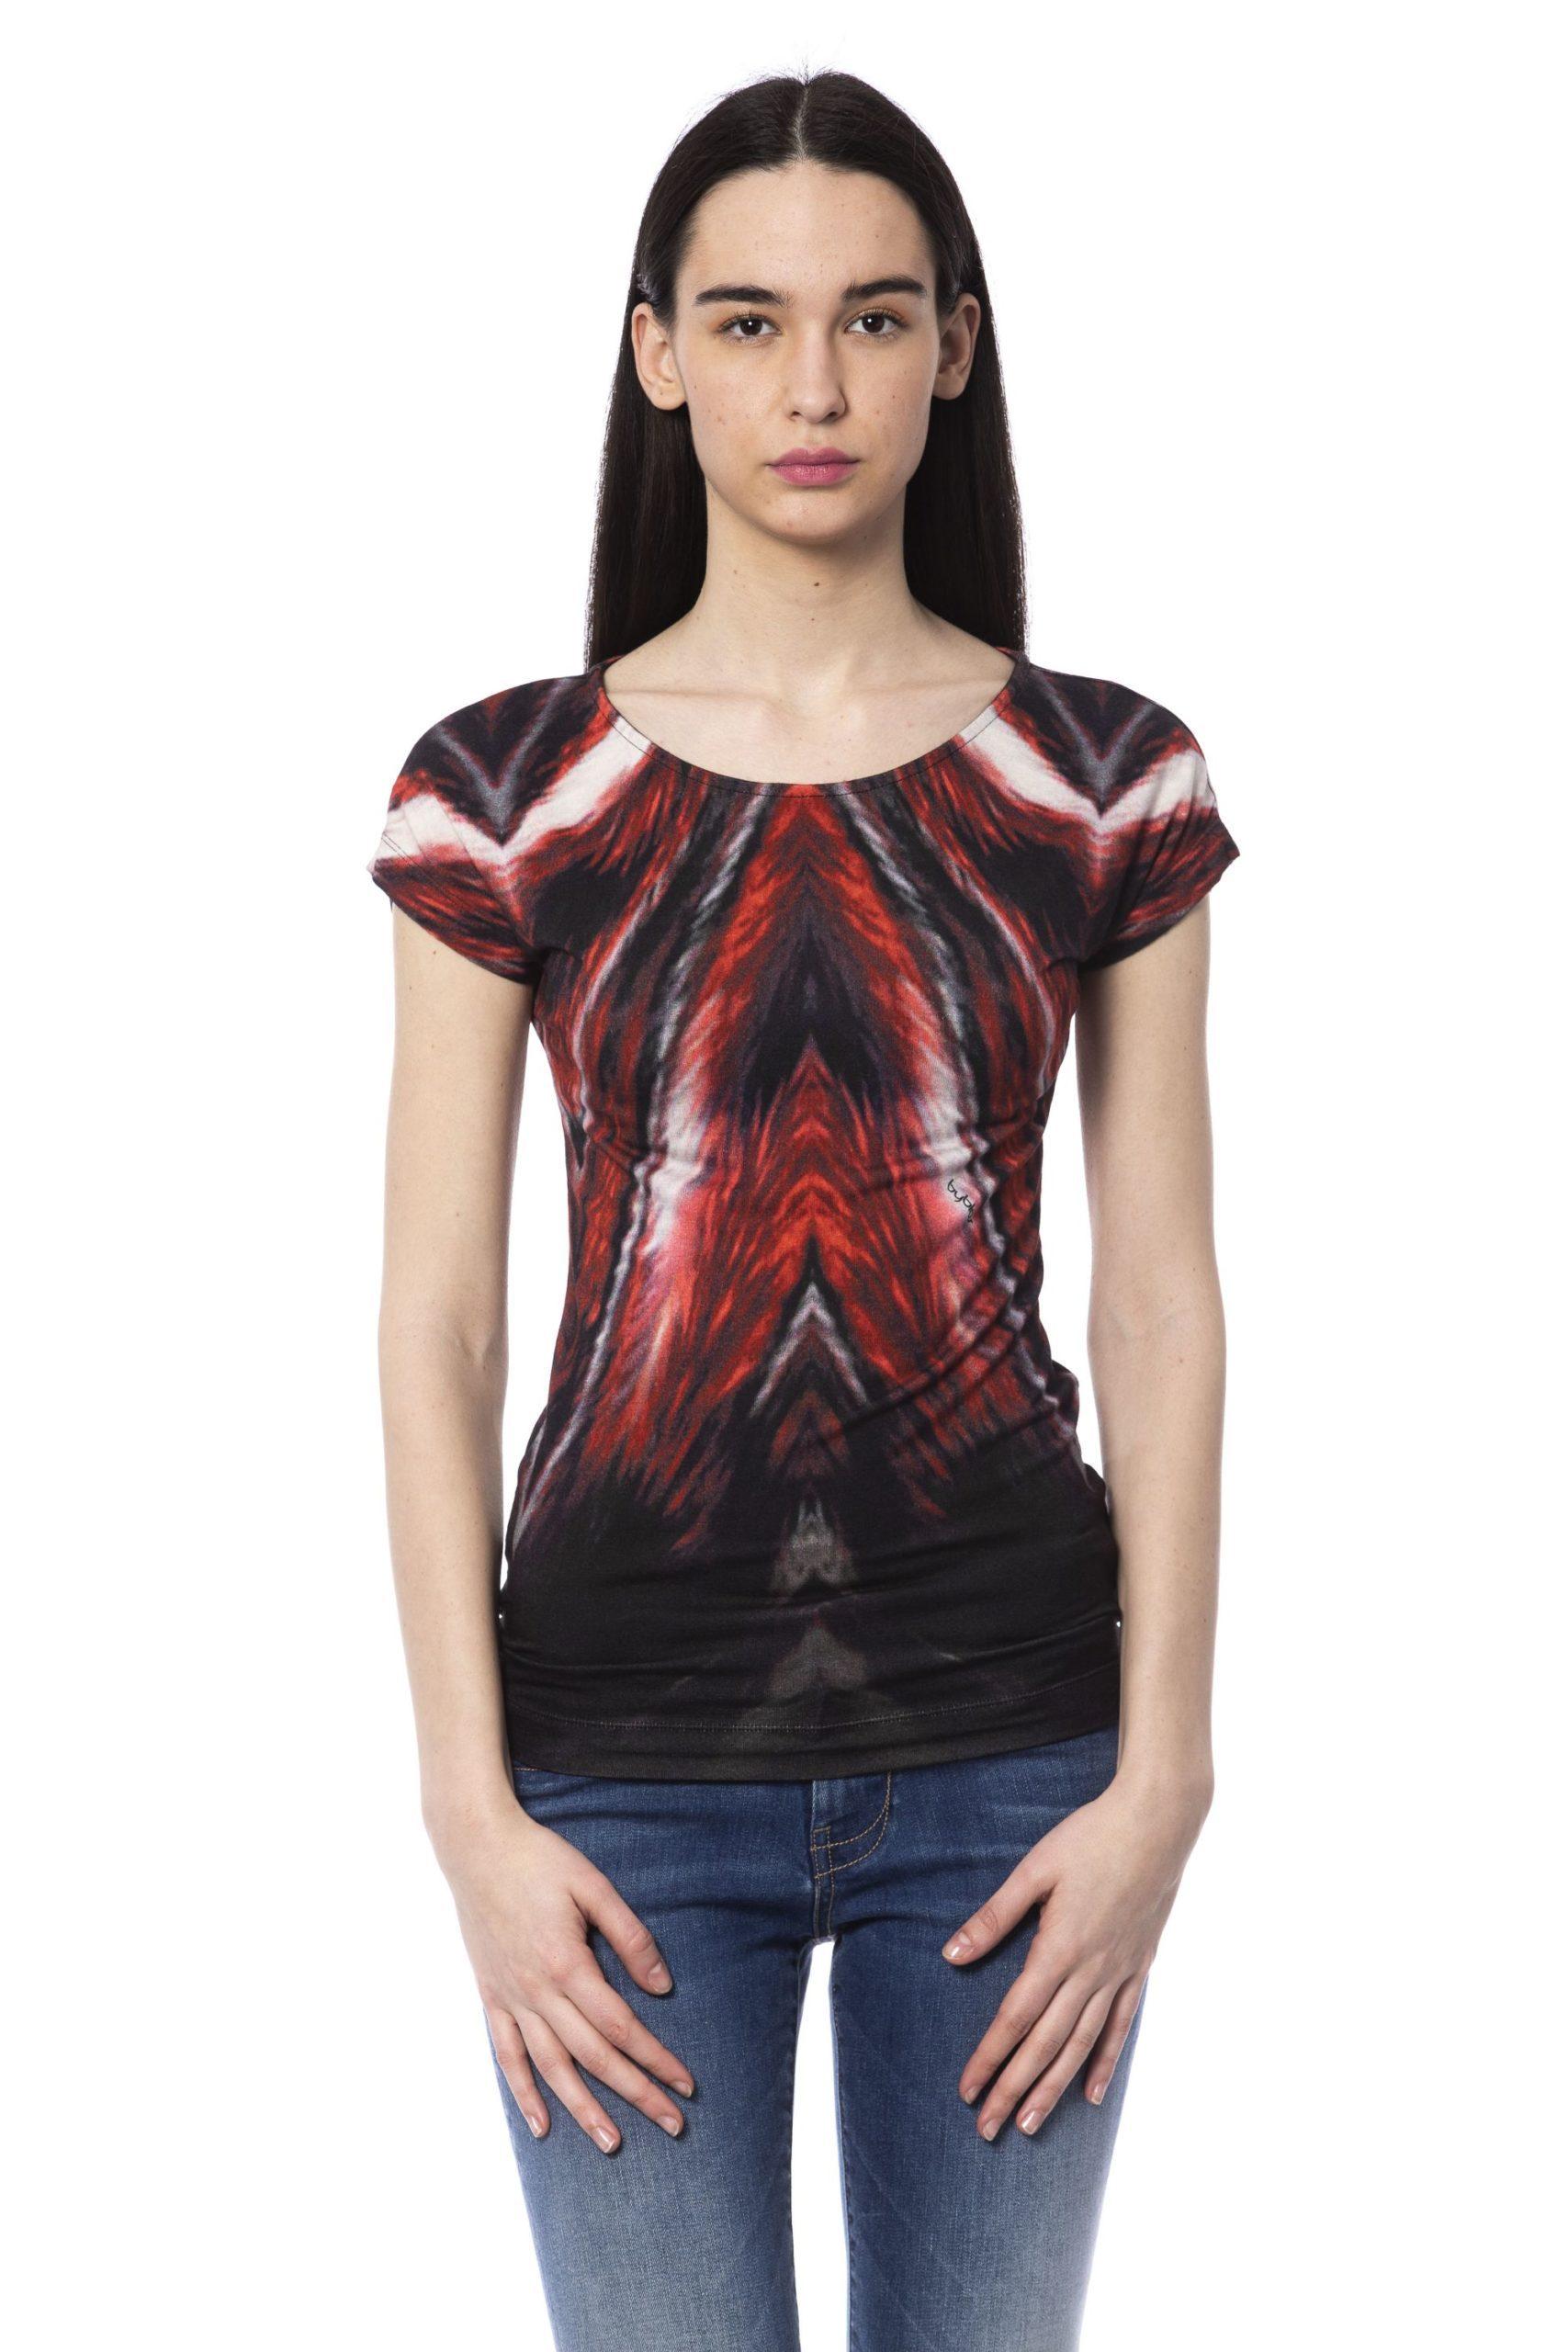 BYBLOS Women's T-Shirt Multicolor BY1234703 - XS